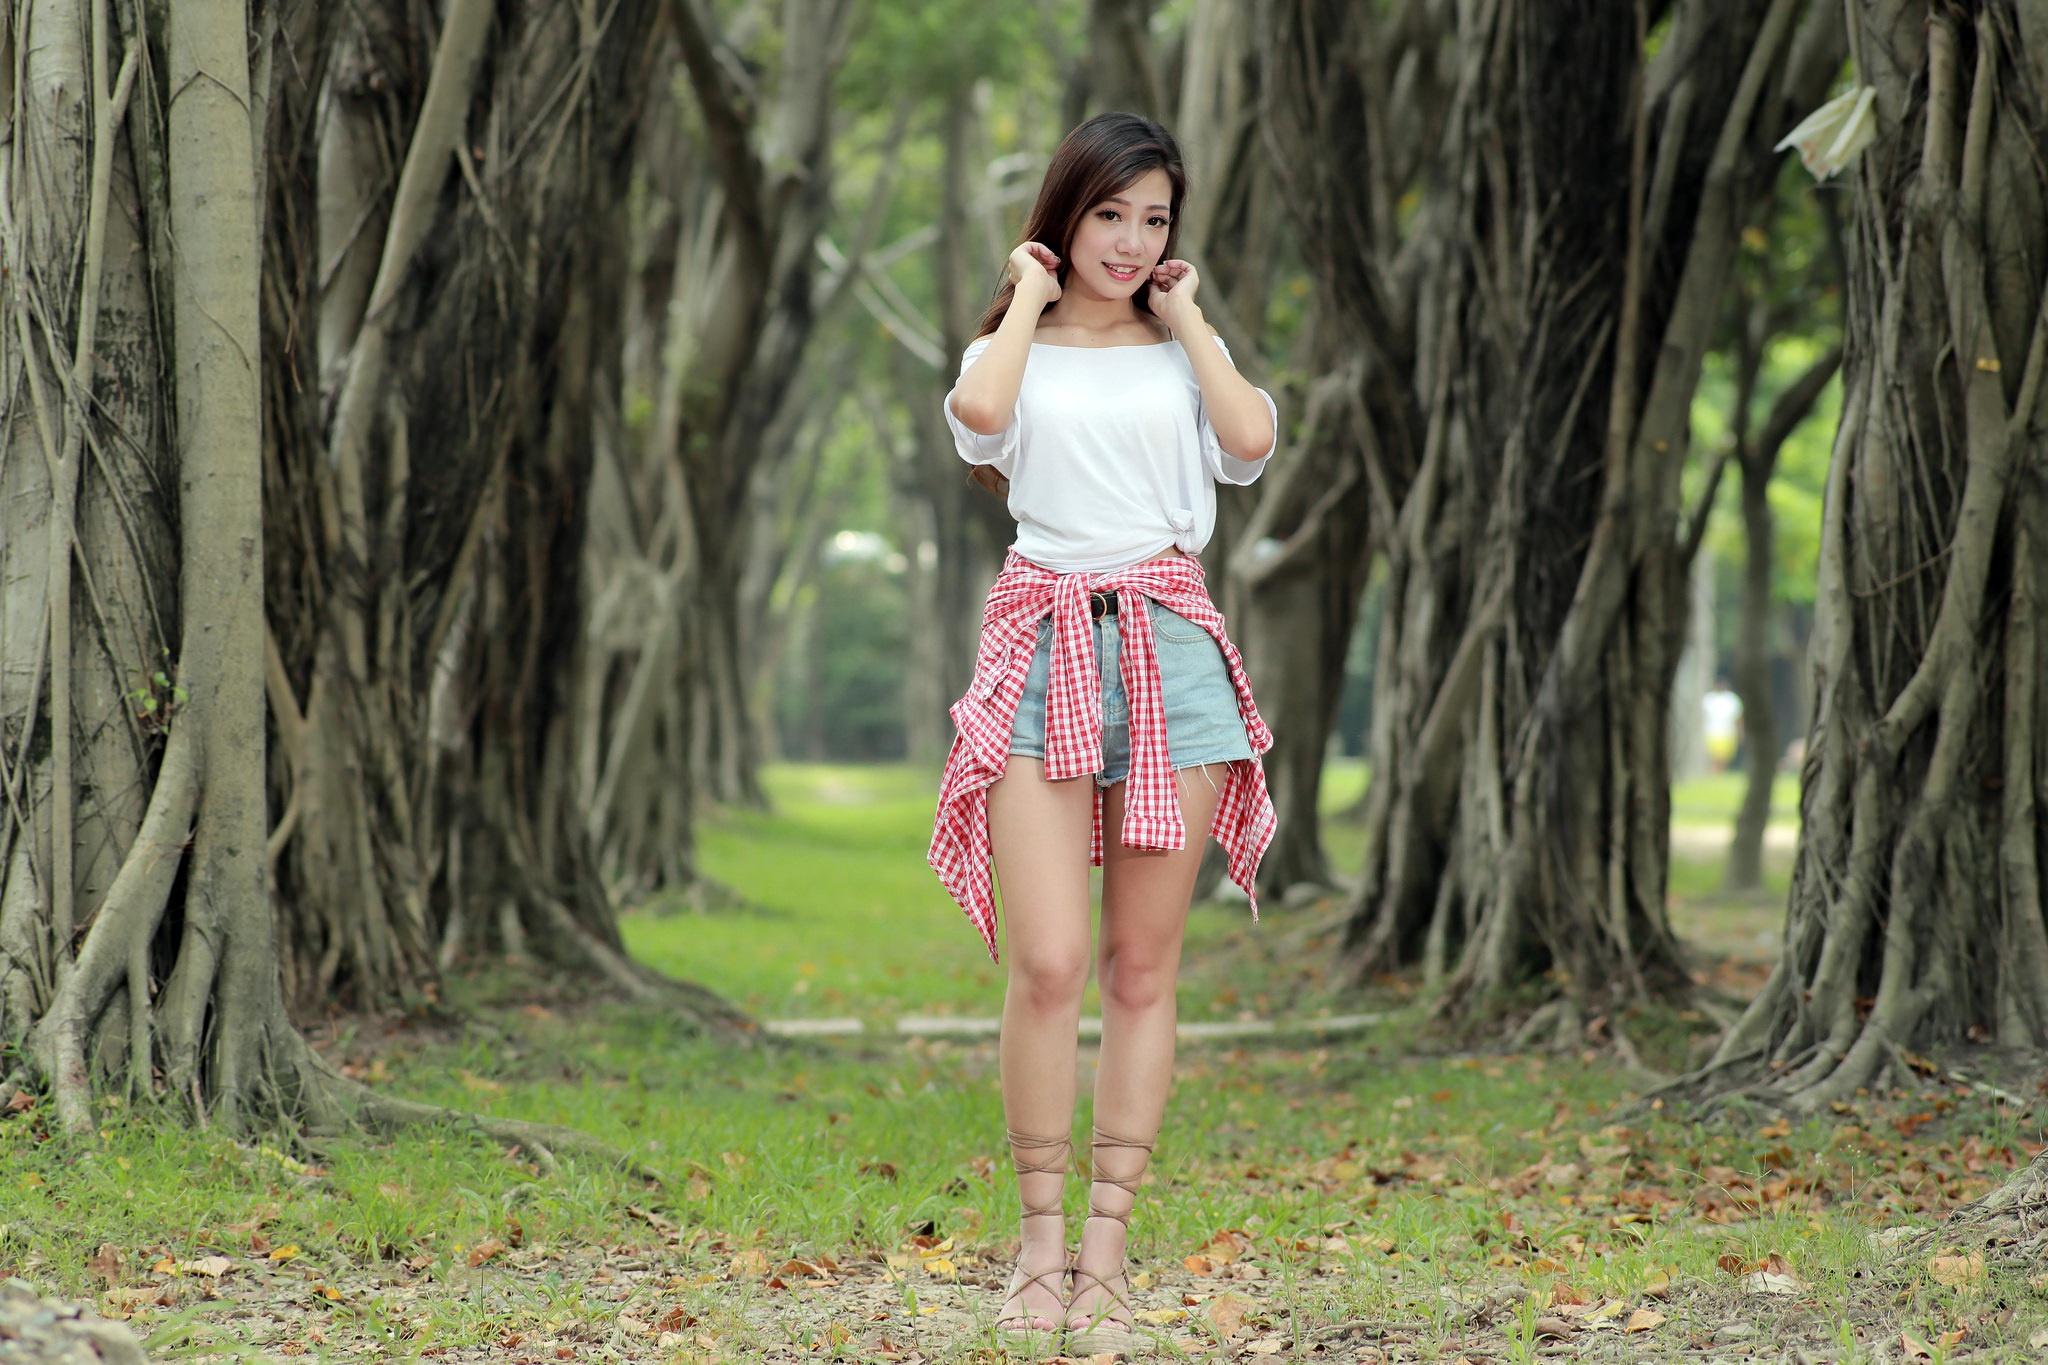 outdoor-girl-asian-home-video-of-wife-creampie